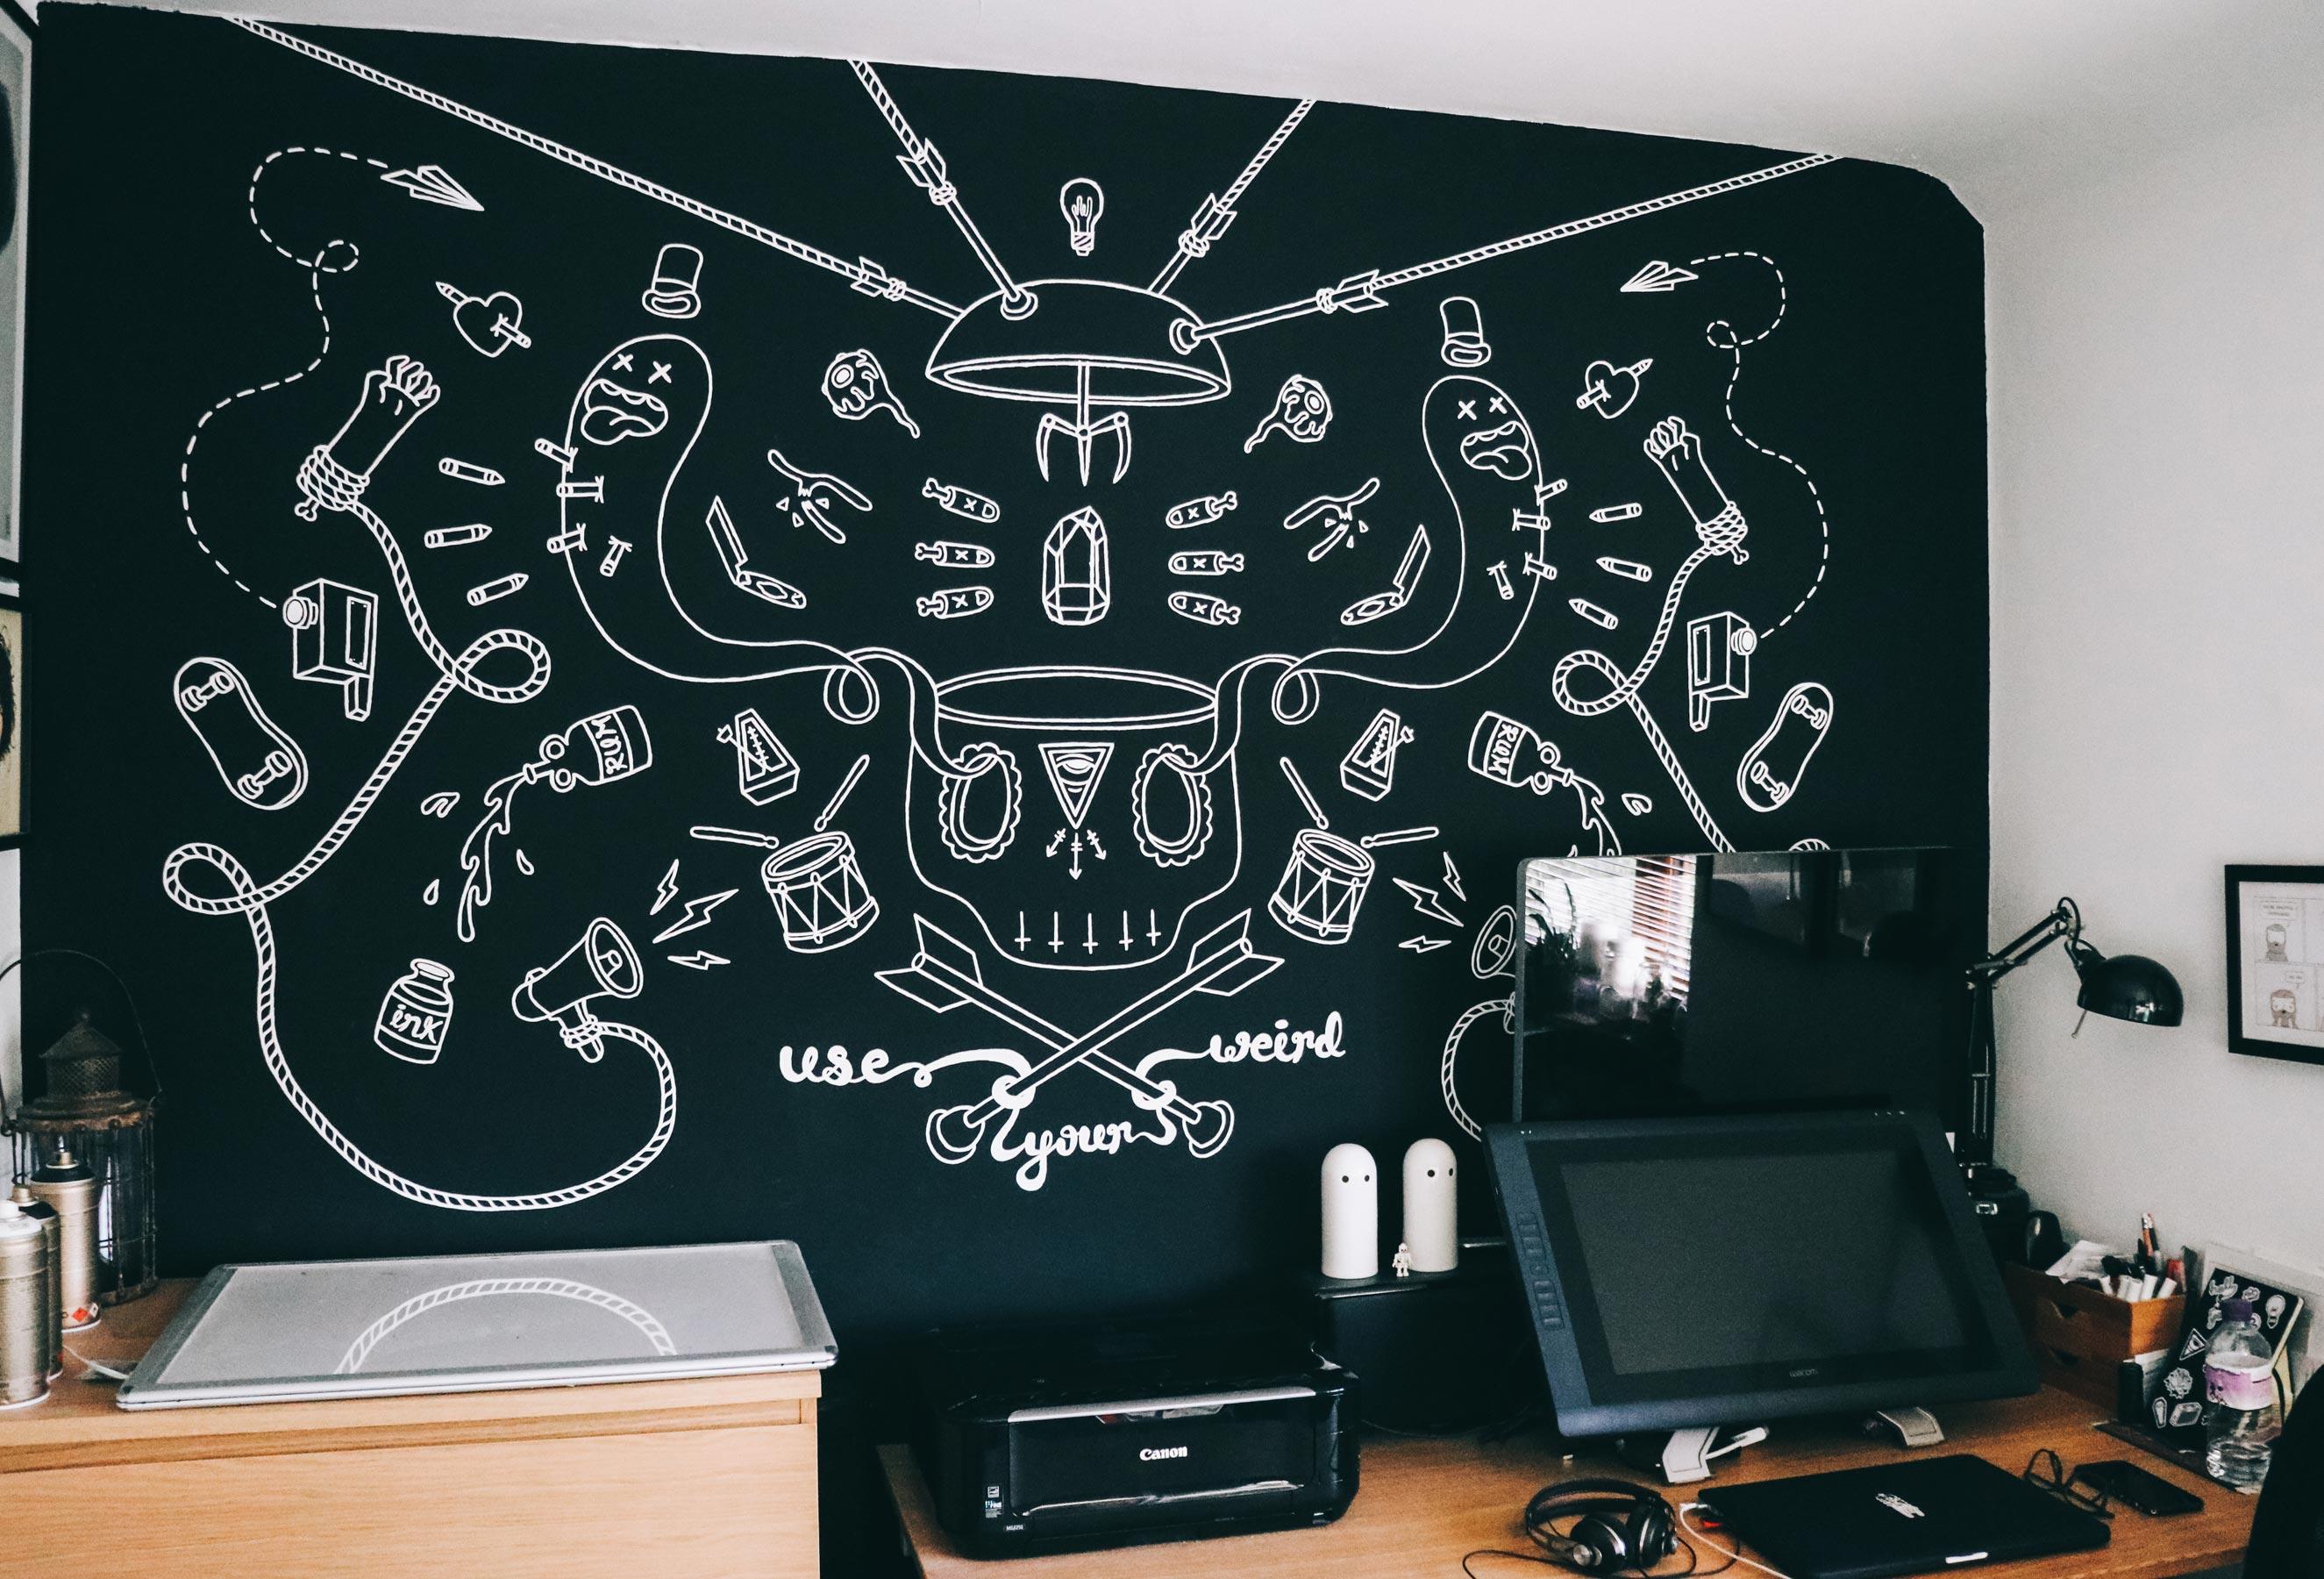 Use Your Weird Mural